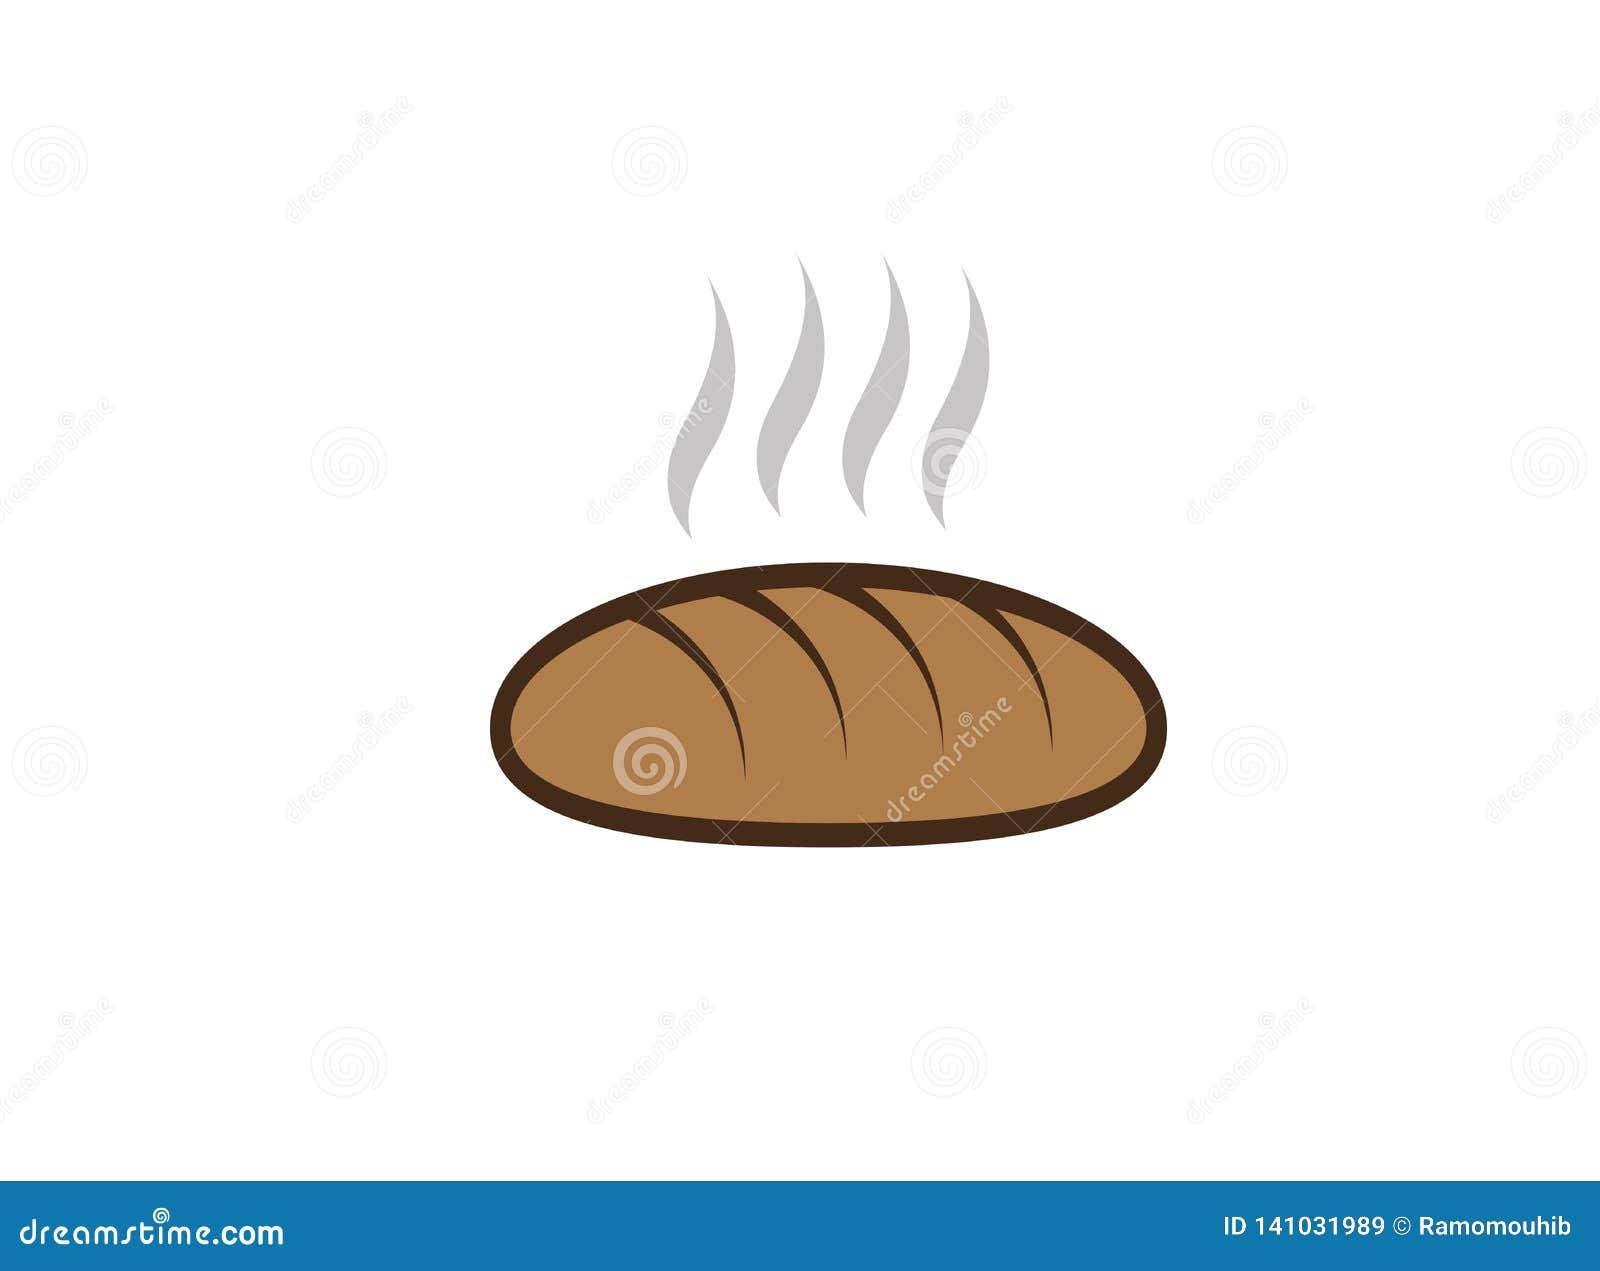 Creative hot Bread for logo design illustration, bakery shop symbol